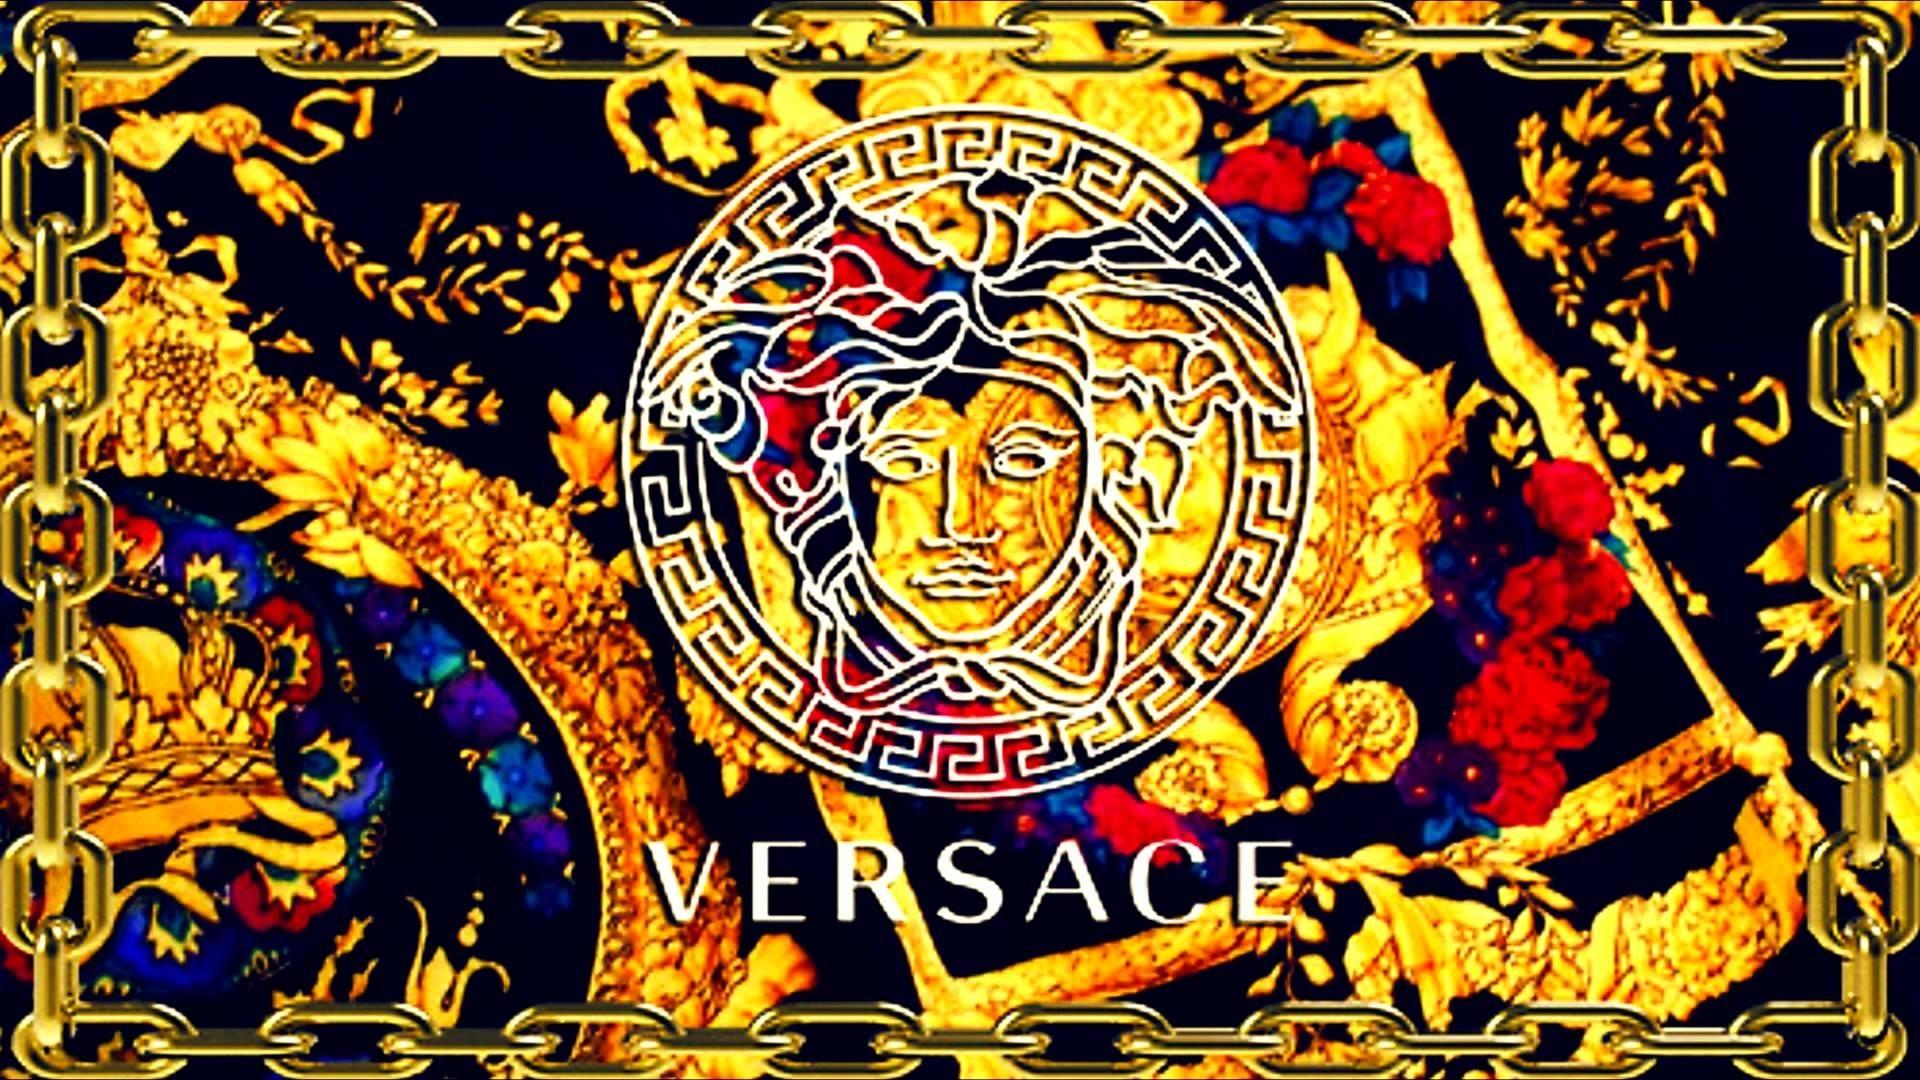 Photo Collection Versace Wallpaper Computer